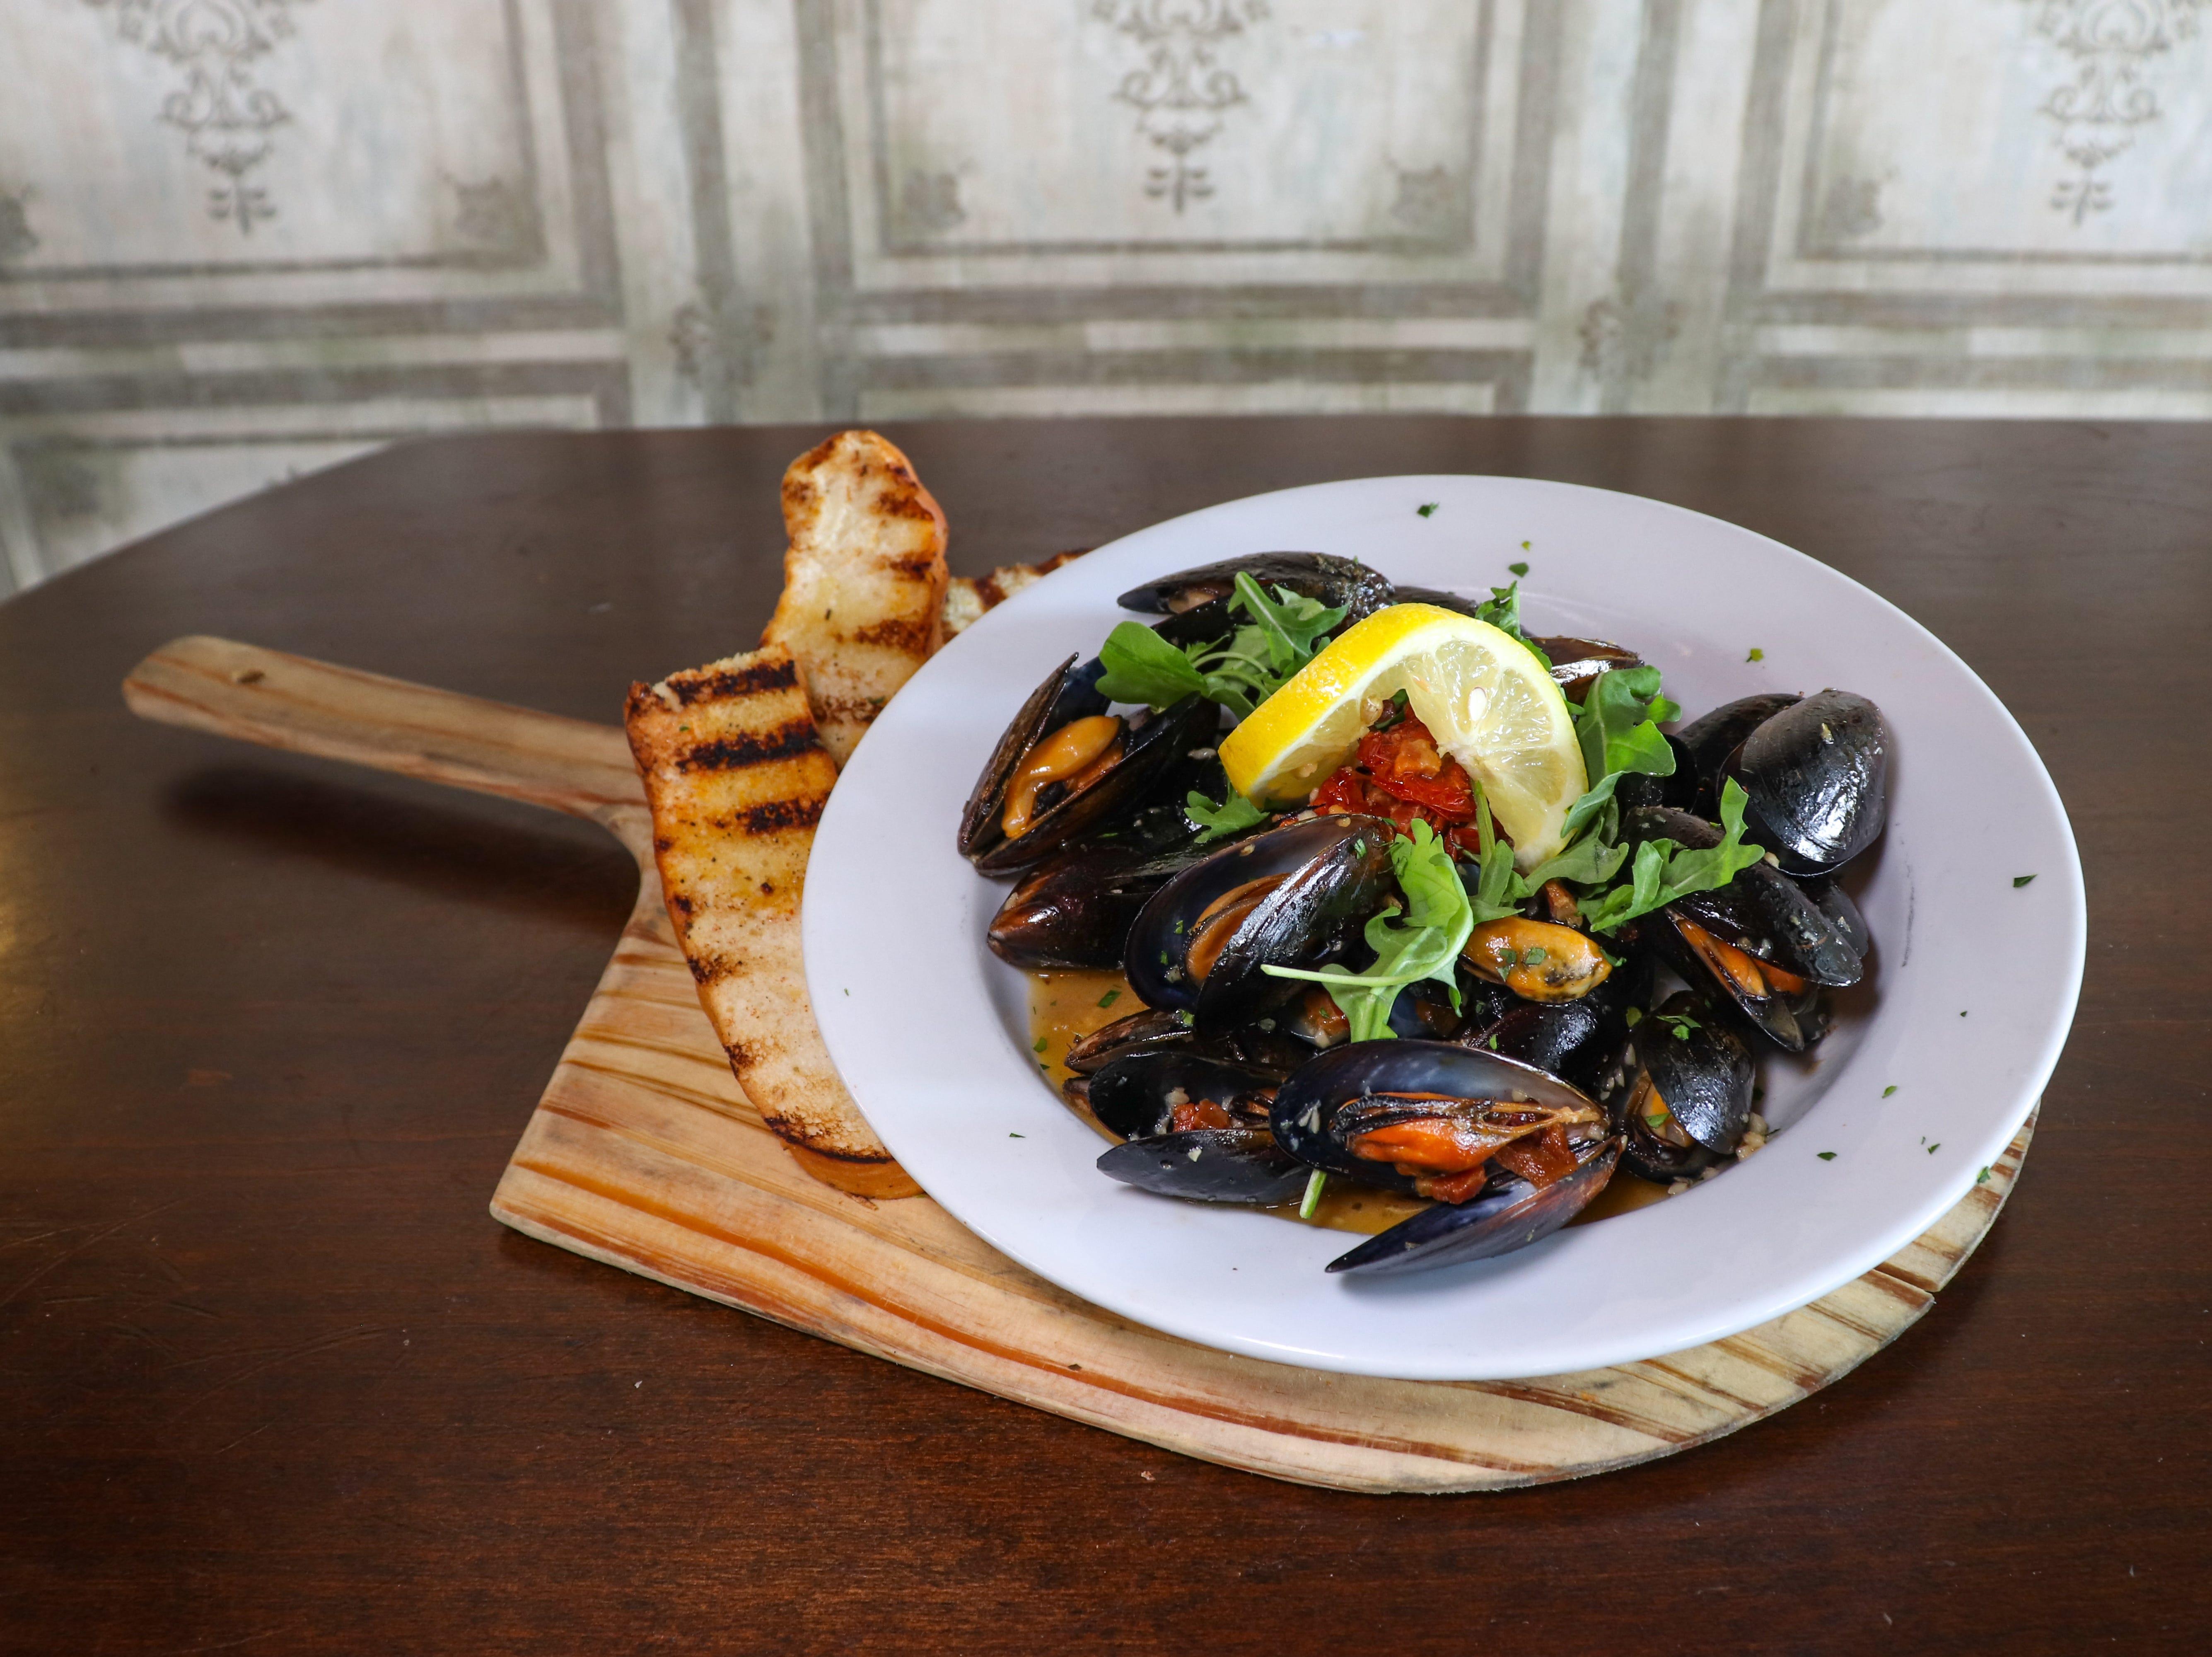 Mussels at Crust Pizzeria and Italian Restaurant.